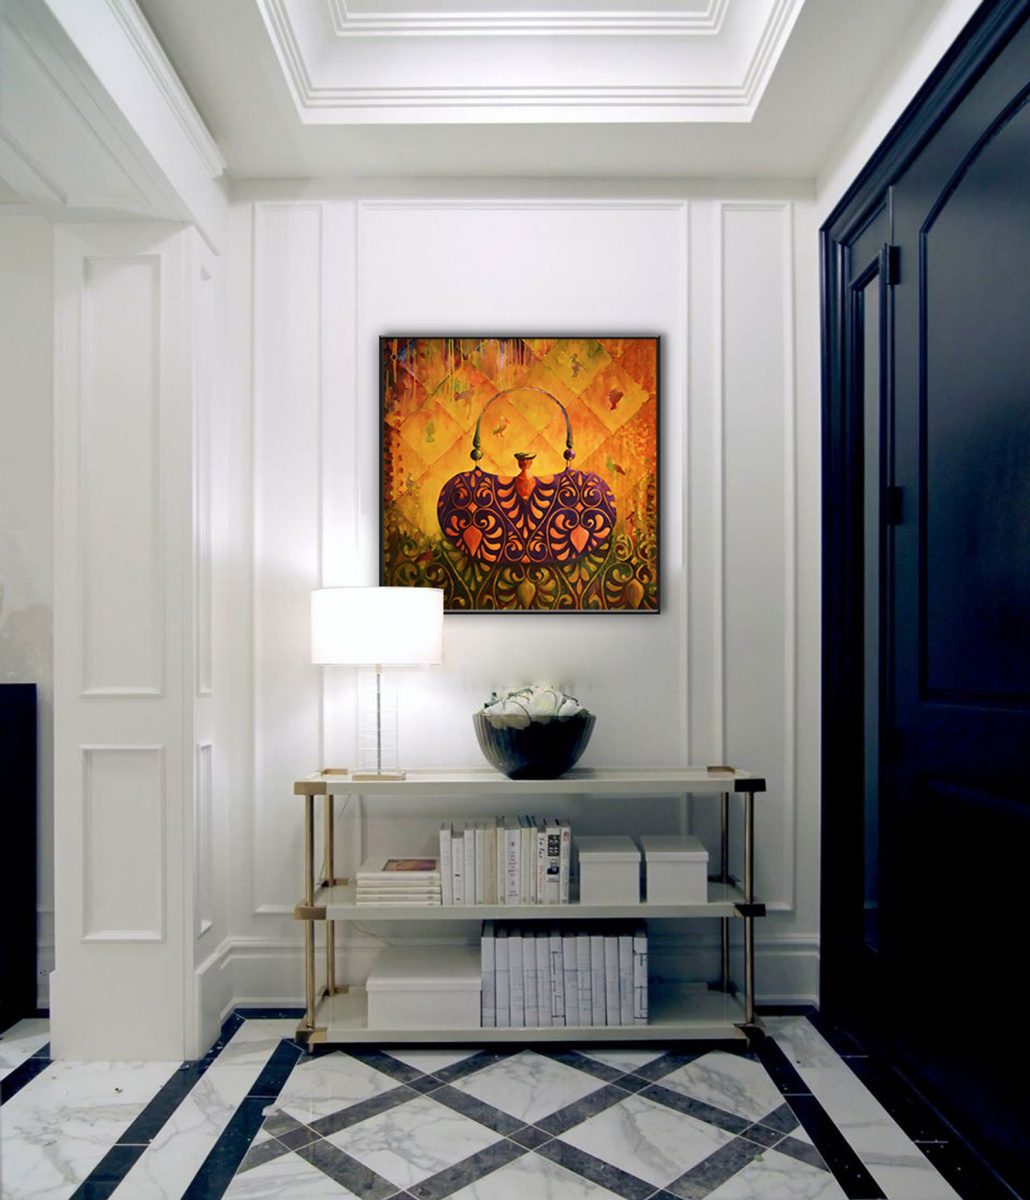 GLAMOUR BB 80*80 cm, original oil painting